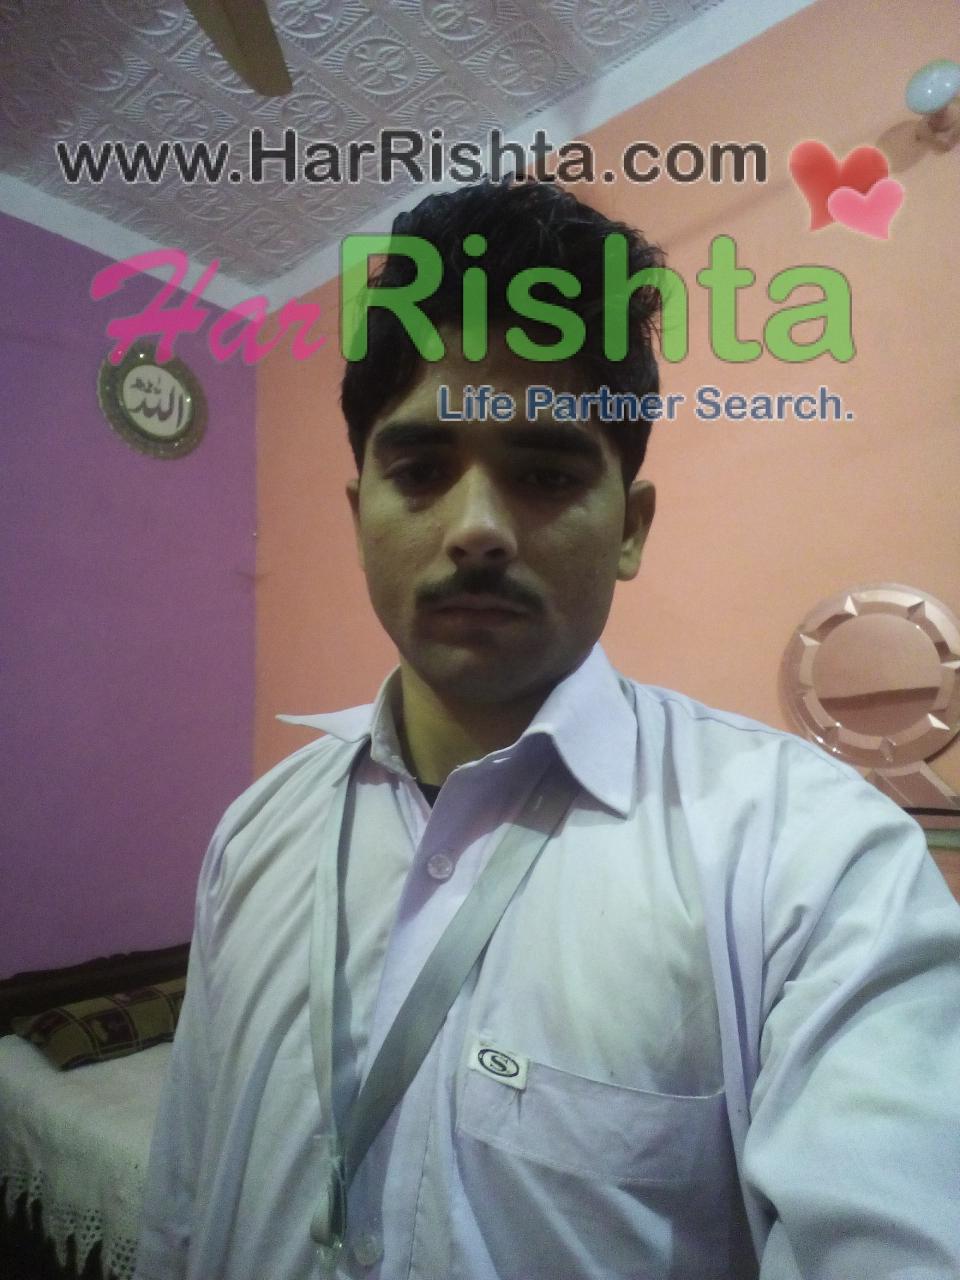 Sheikh Boy Rishta in Lakki Marwat